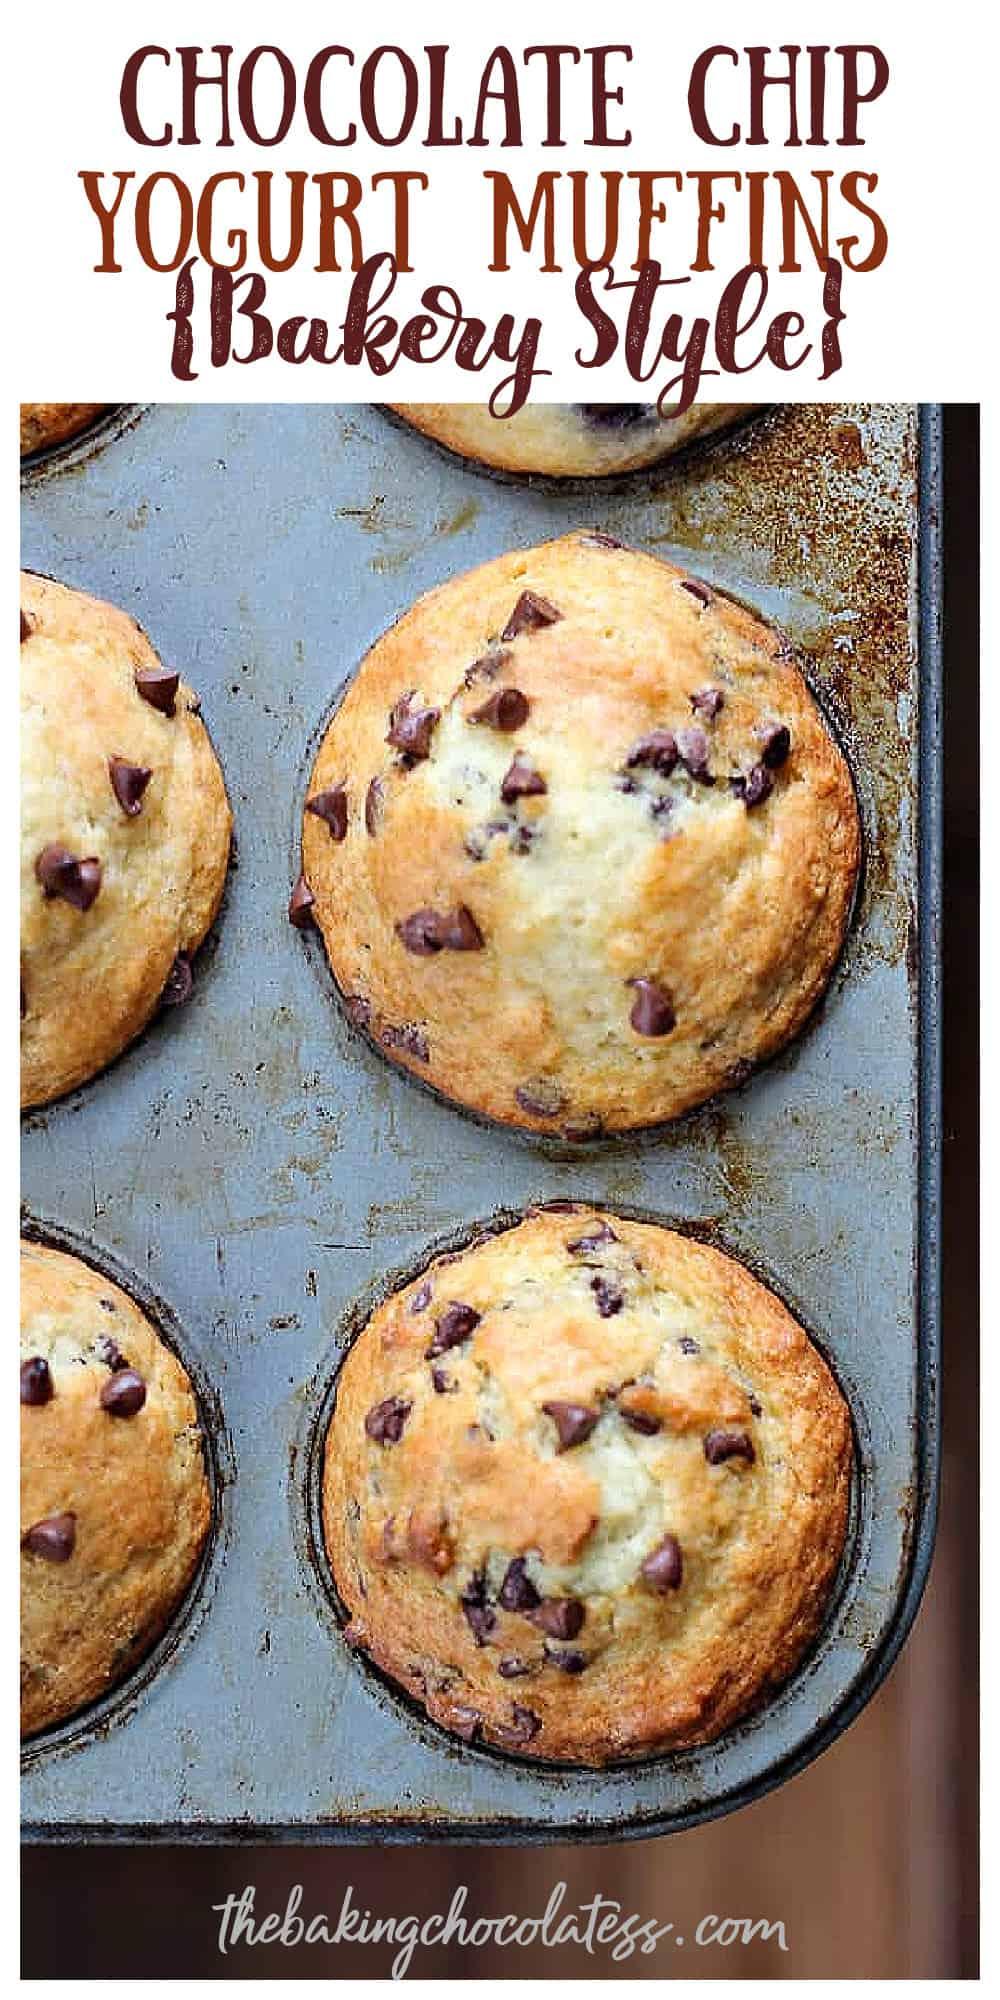 Chocolate Chip Yogurt Muffins {Bakery Style}